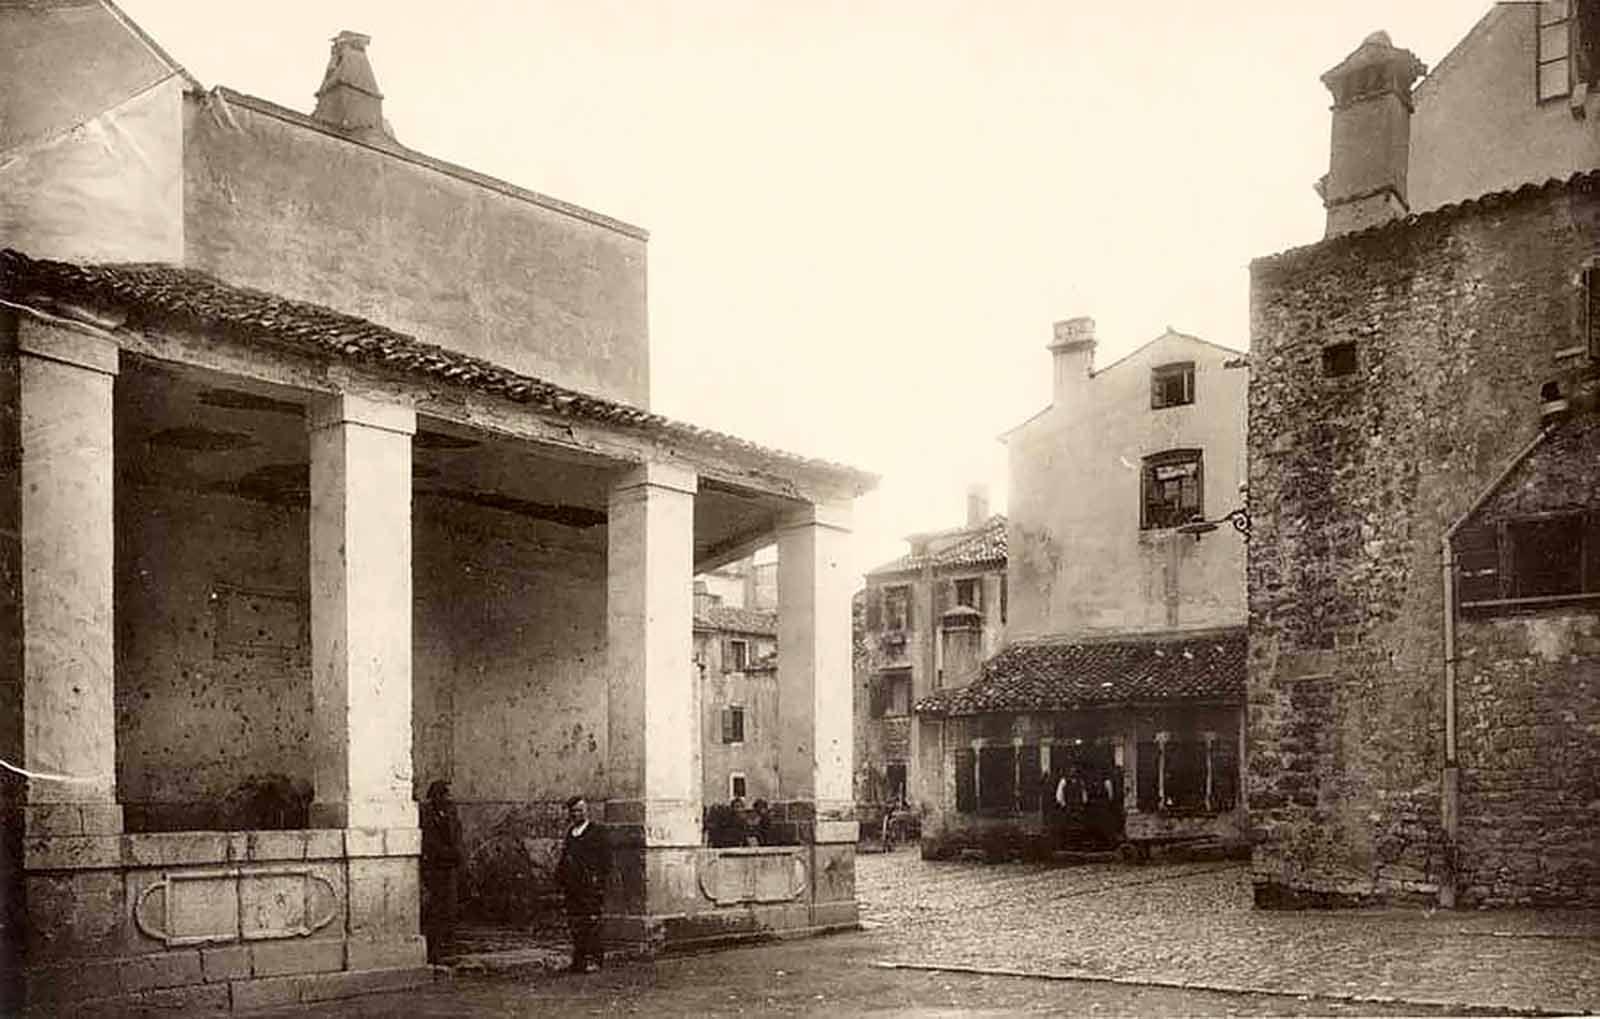 Pile market in Zadar, 1903